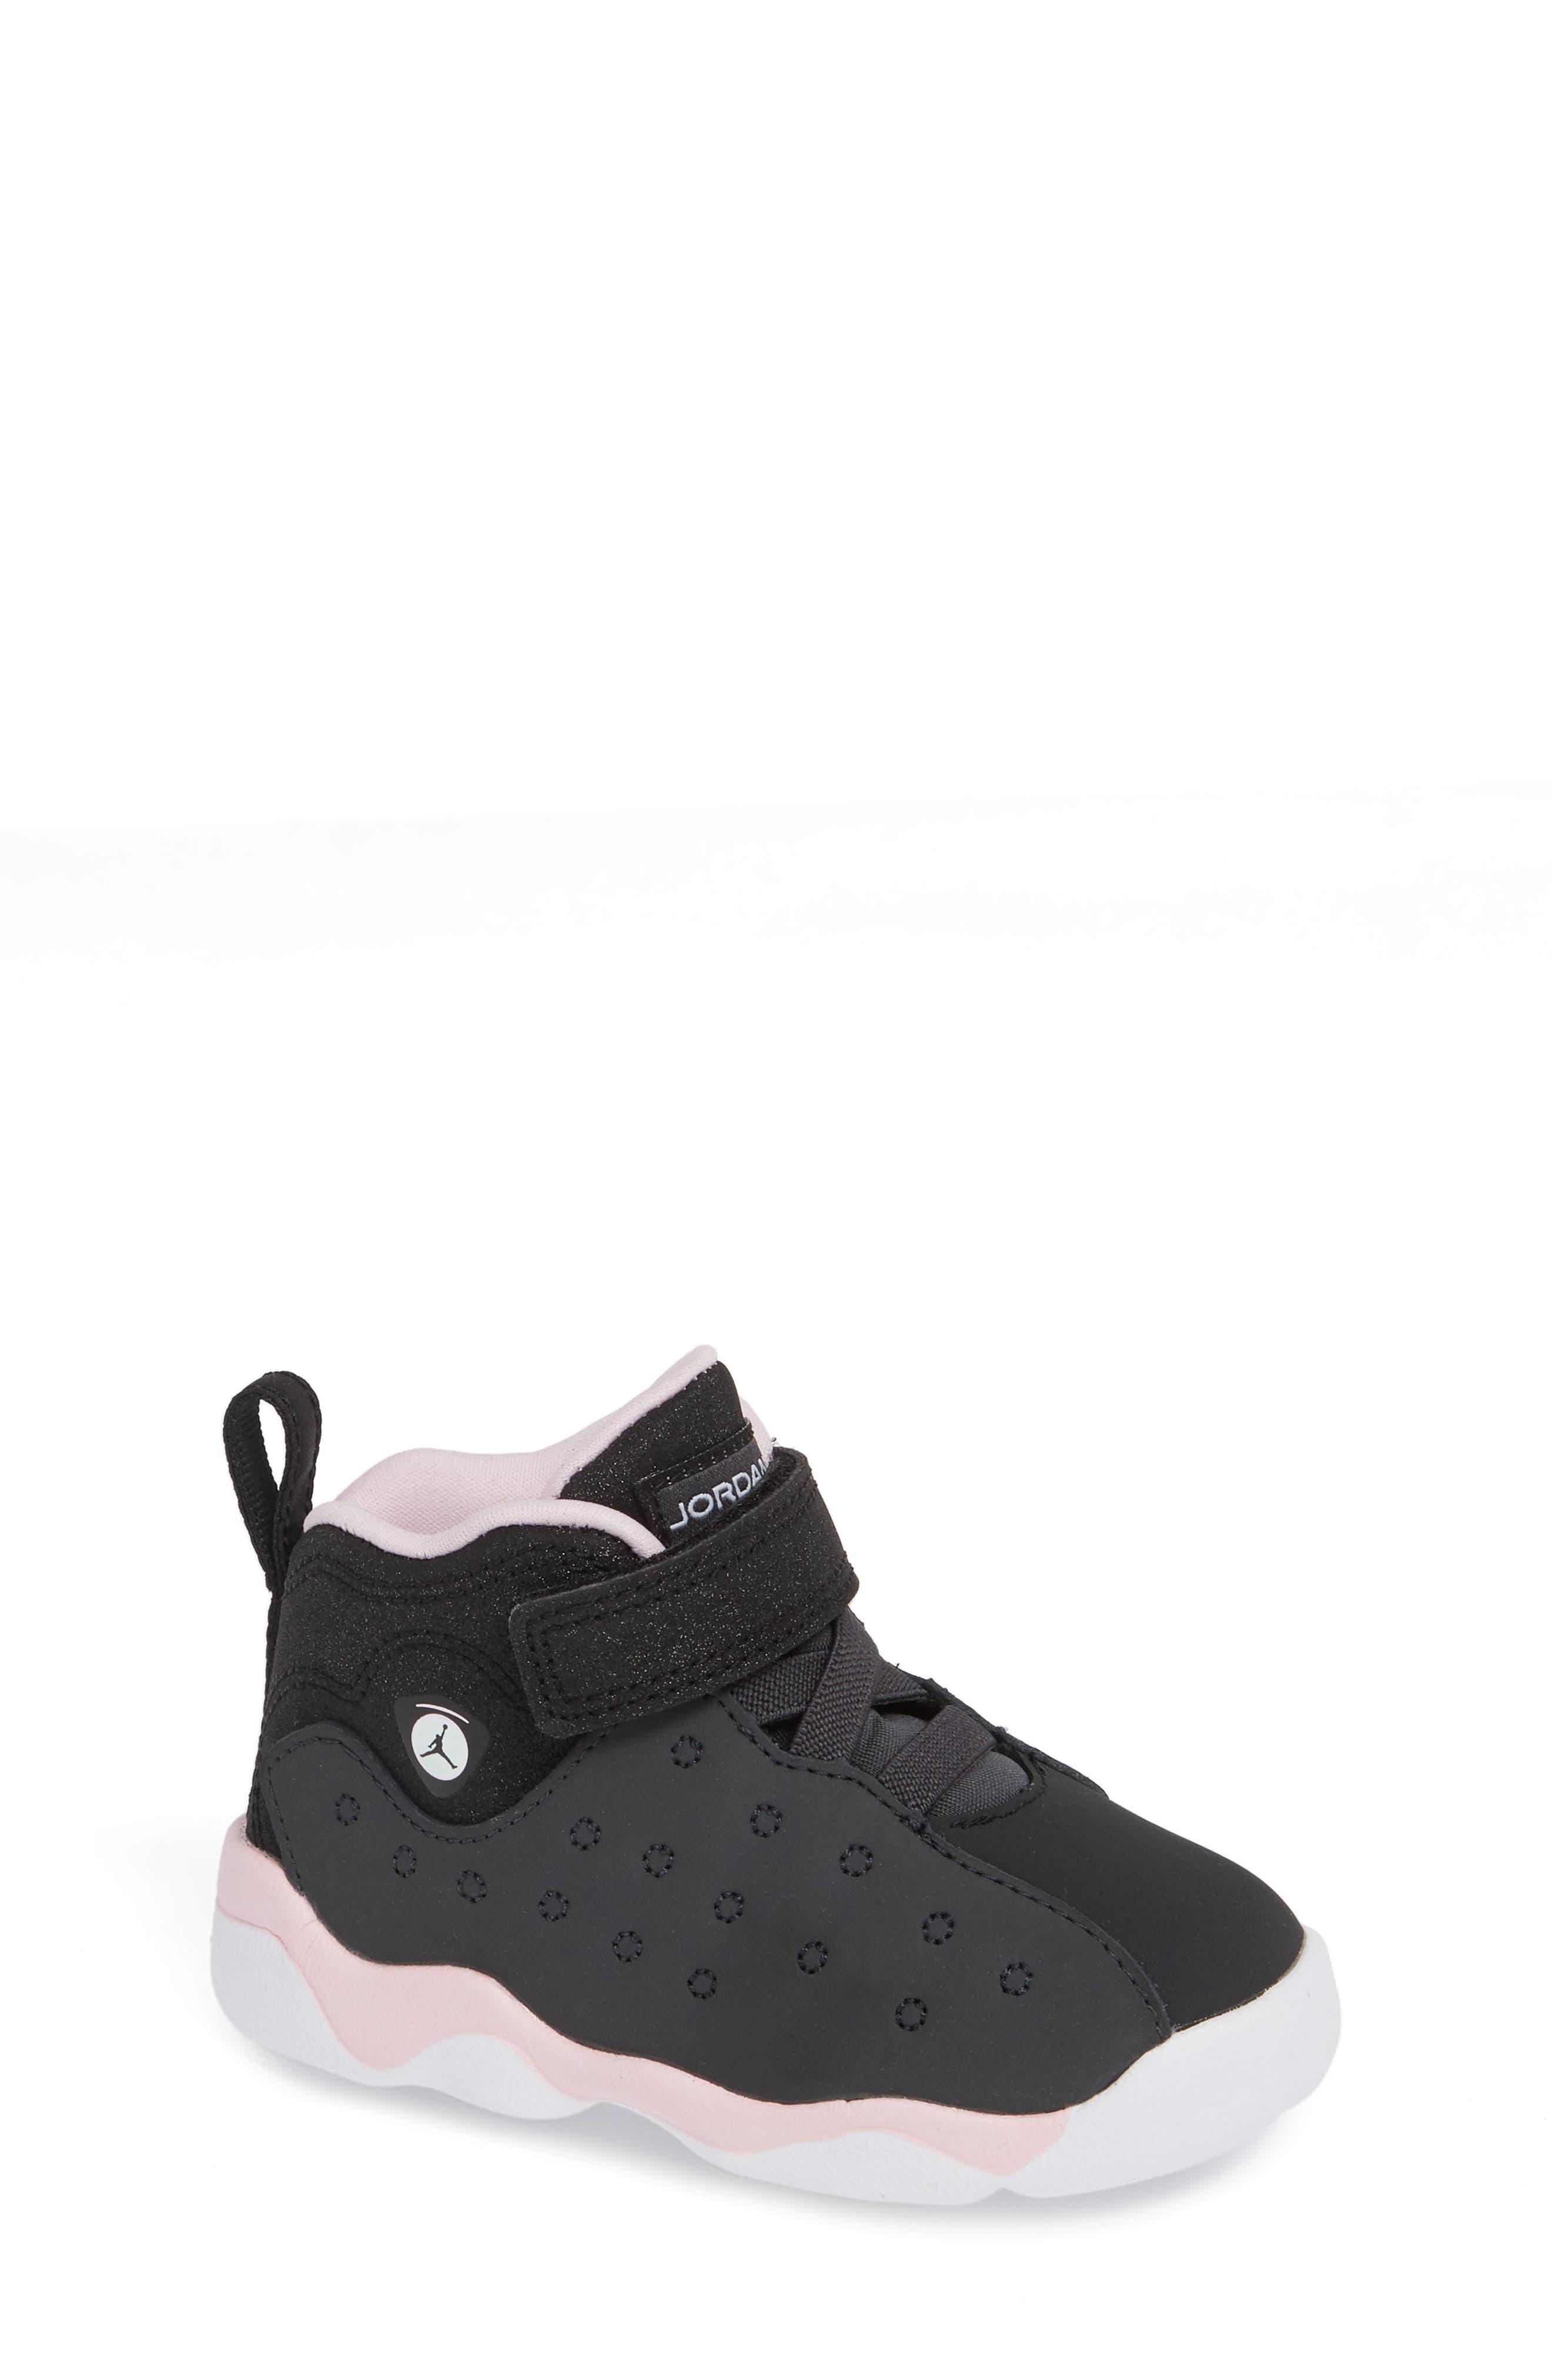 037651d9df03 Big Boys  Jordan Shoes (Sizes 3.5-7)